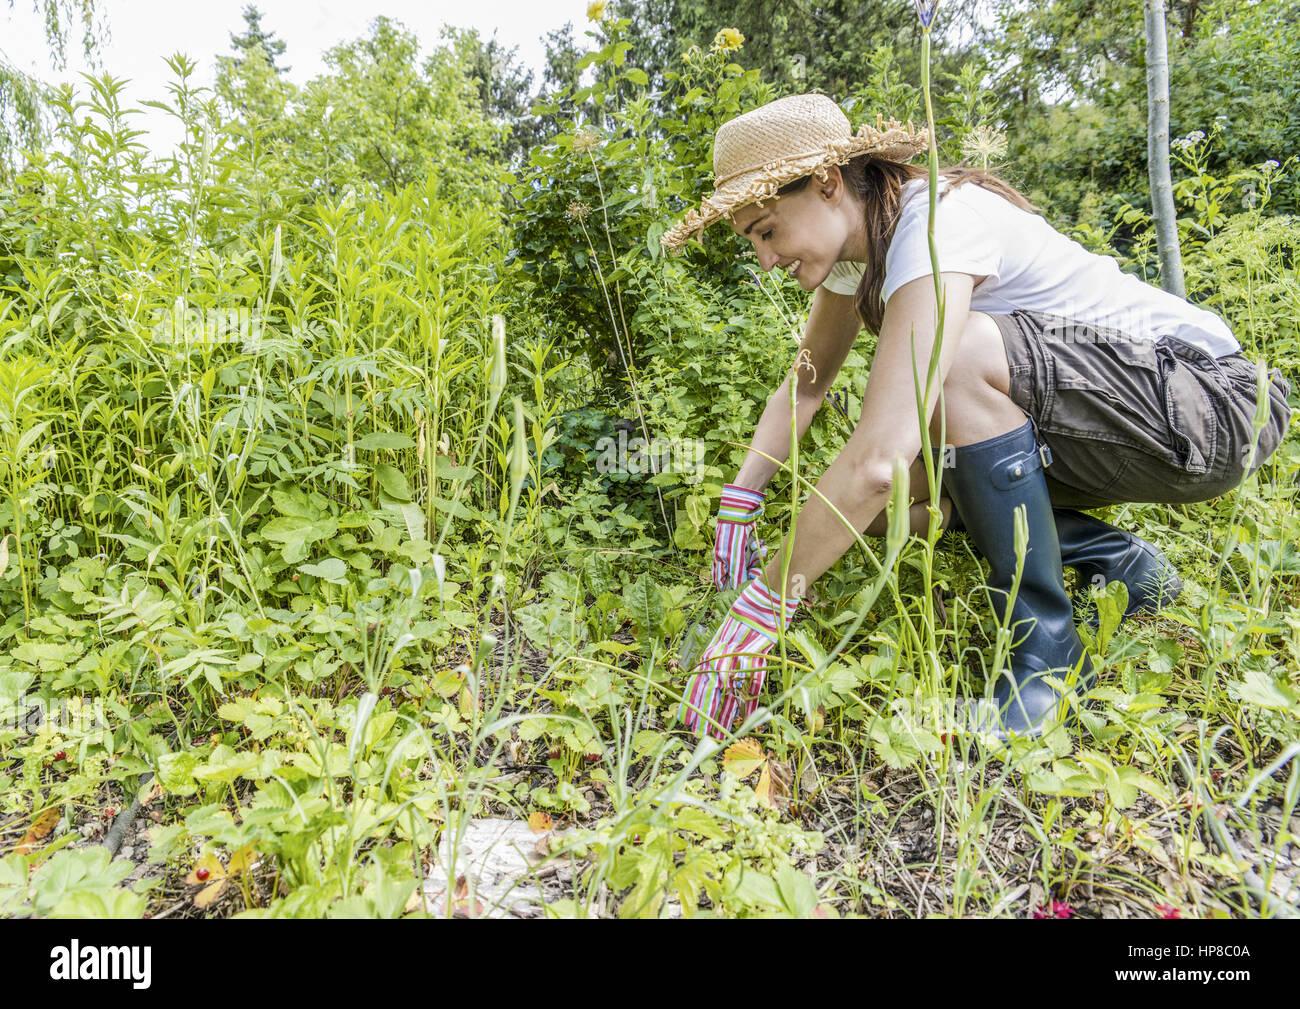 Garten Unkraut Stock Photos Garten Unkraut Stock Images Alamy